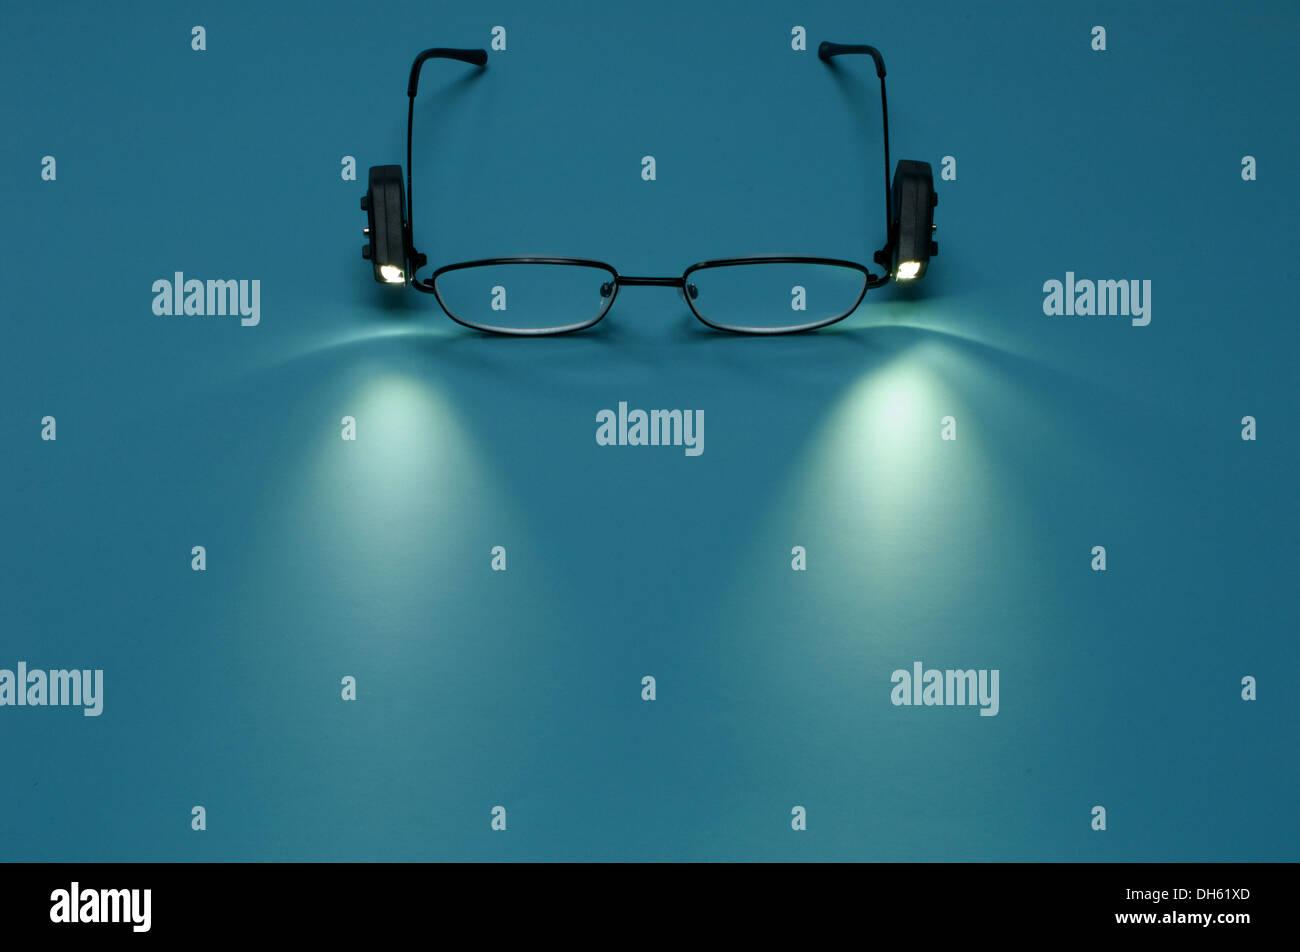 Discovery immagini discovery fotos stock alamy for Piccole planimetrie a concetto aperto